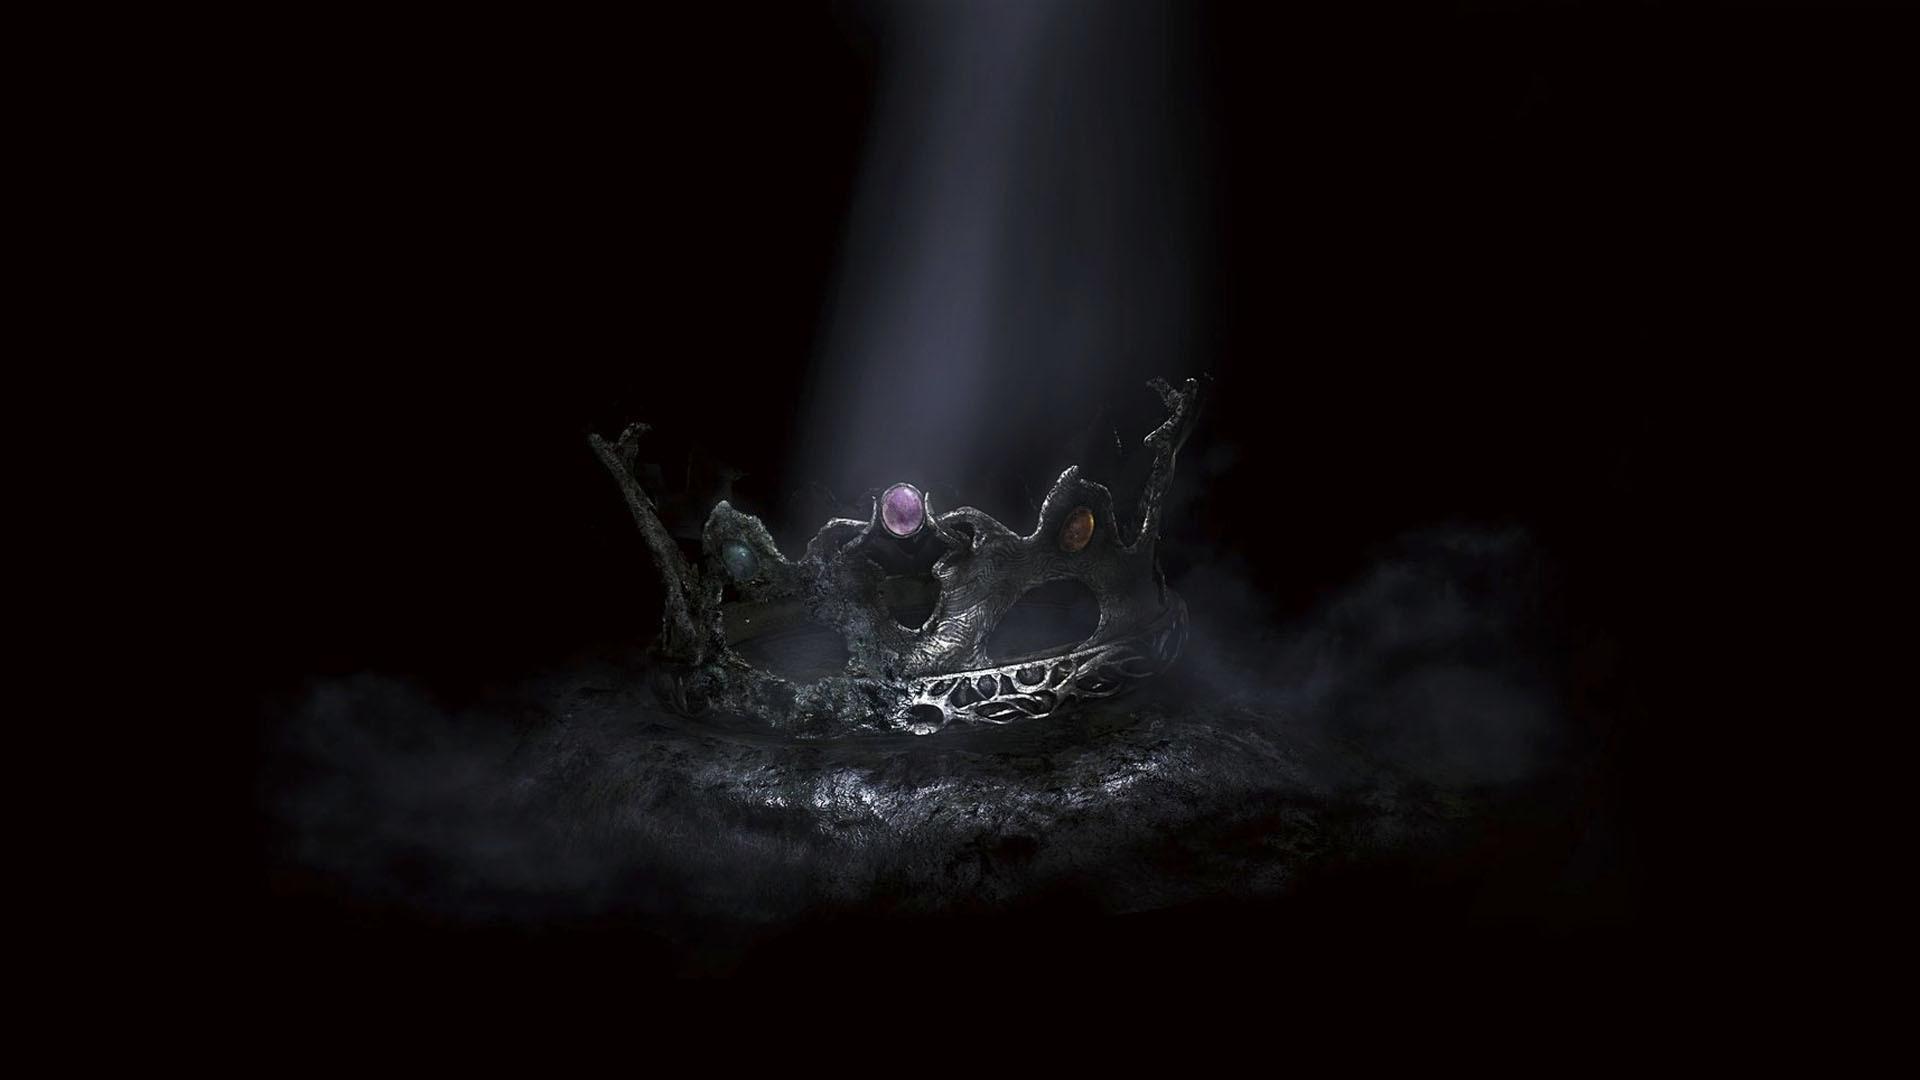 Wallpaper dark souls 2, crown of the sunken king, crown